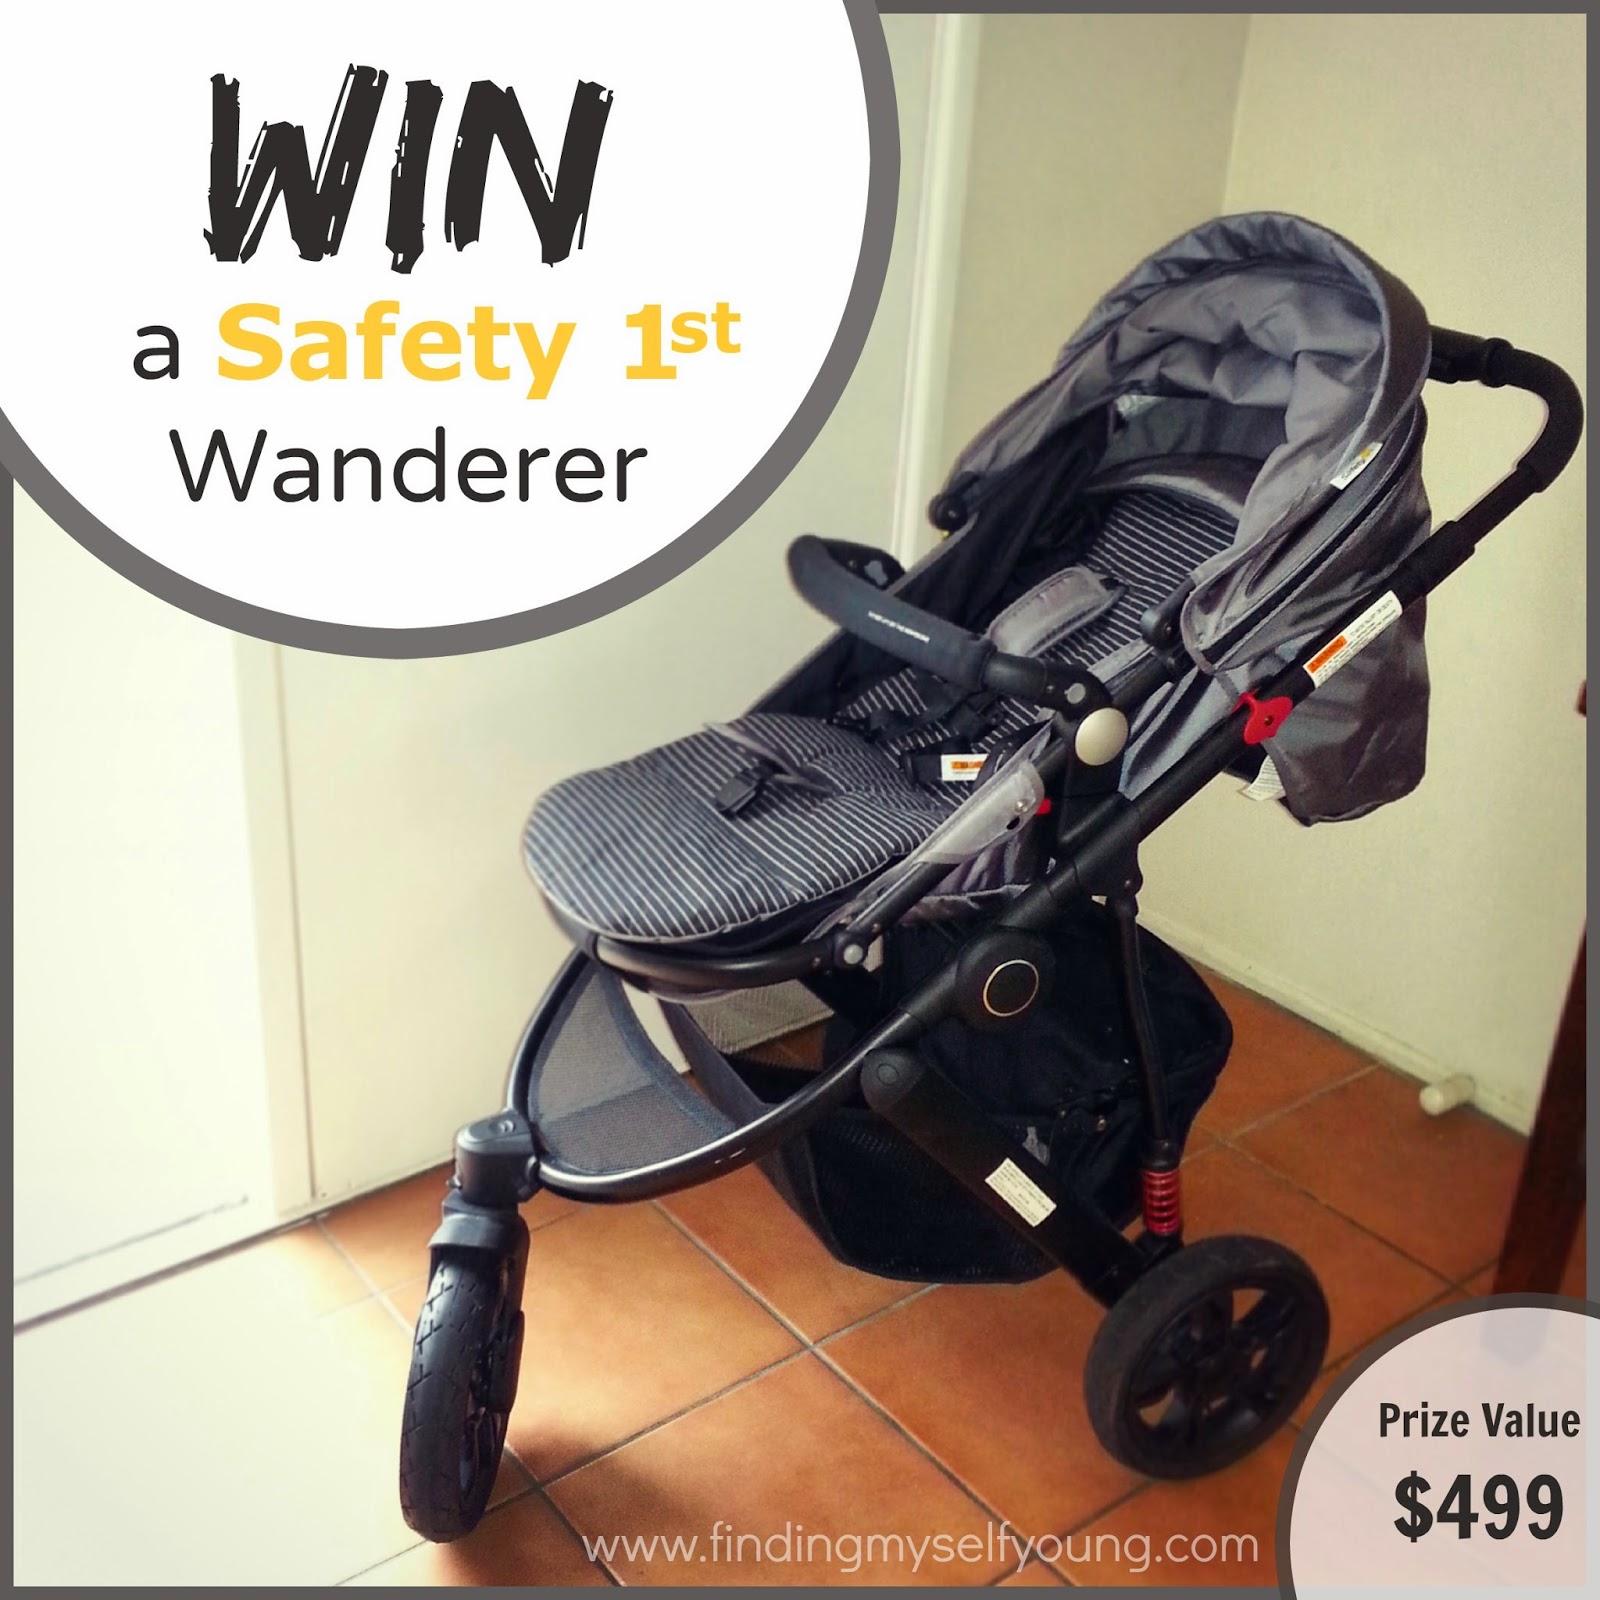 Win a safety 1st wanderer 3 wheel pram